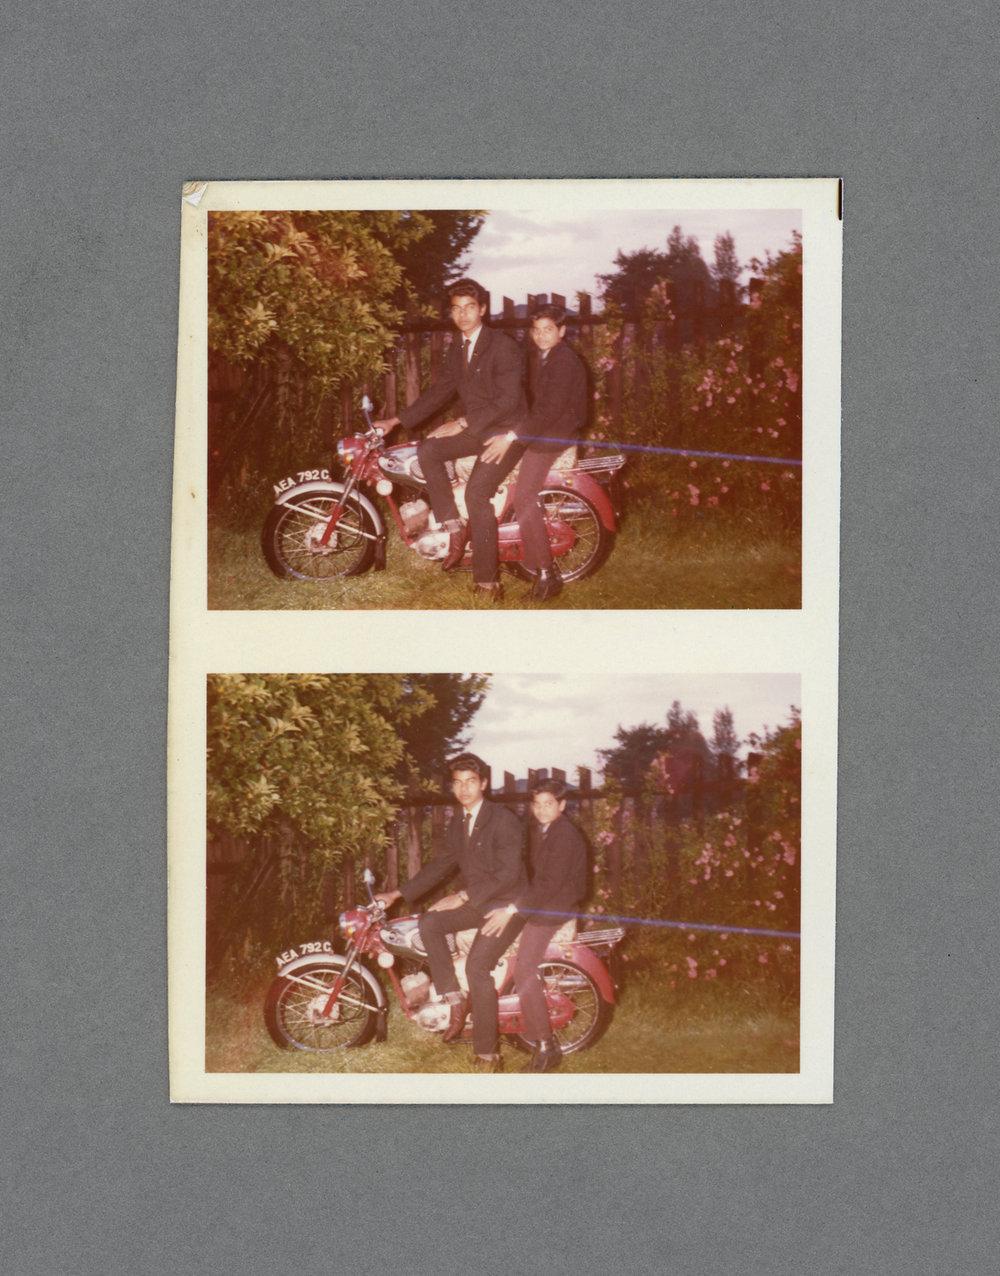 Willenhall Rd. c.1968